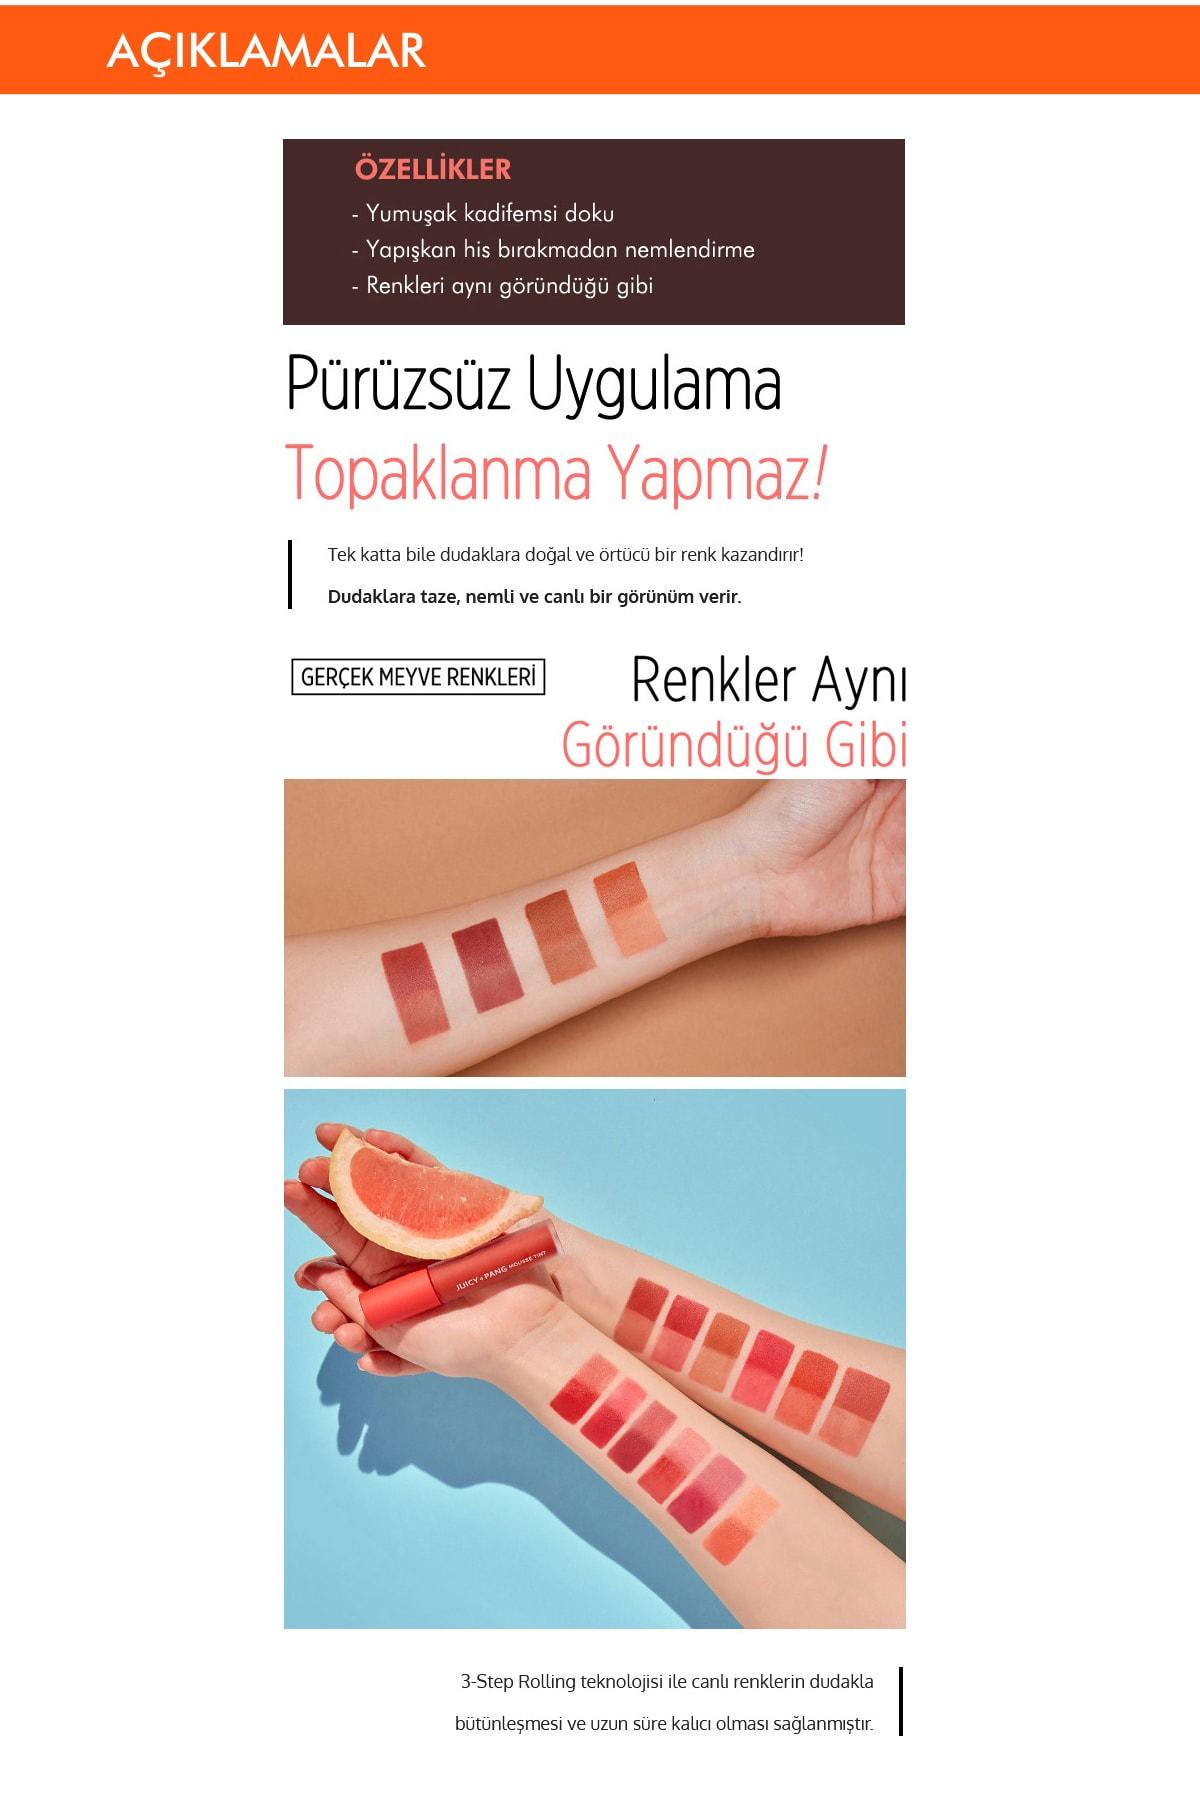 Missha Pürüzsüz Görünüm Sunan Kalıcı Köpük Tint Ruj APIEU Juicy Pang Mousse Tint (PK02) 3